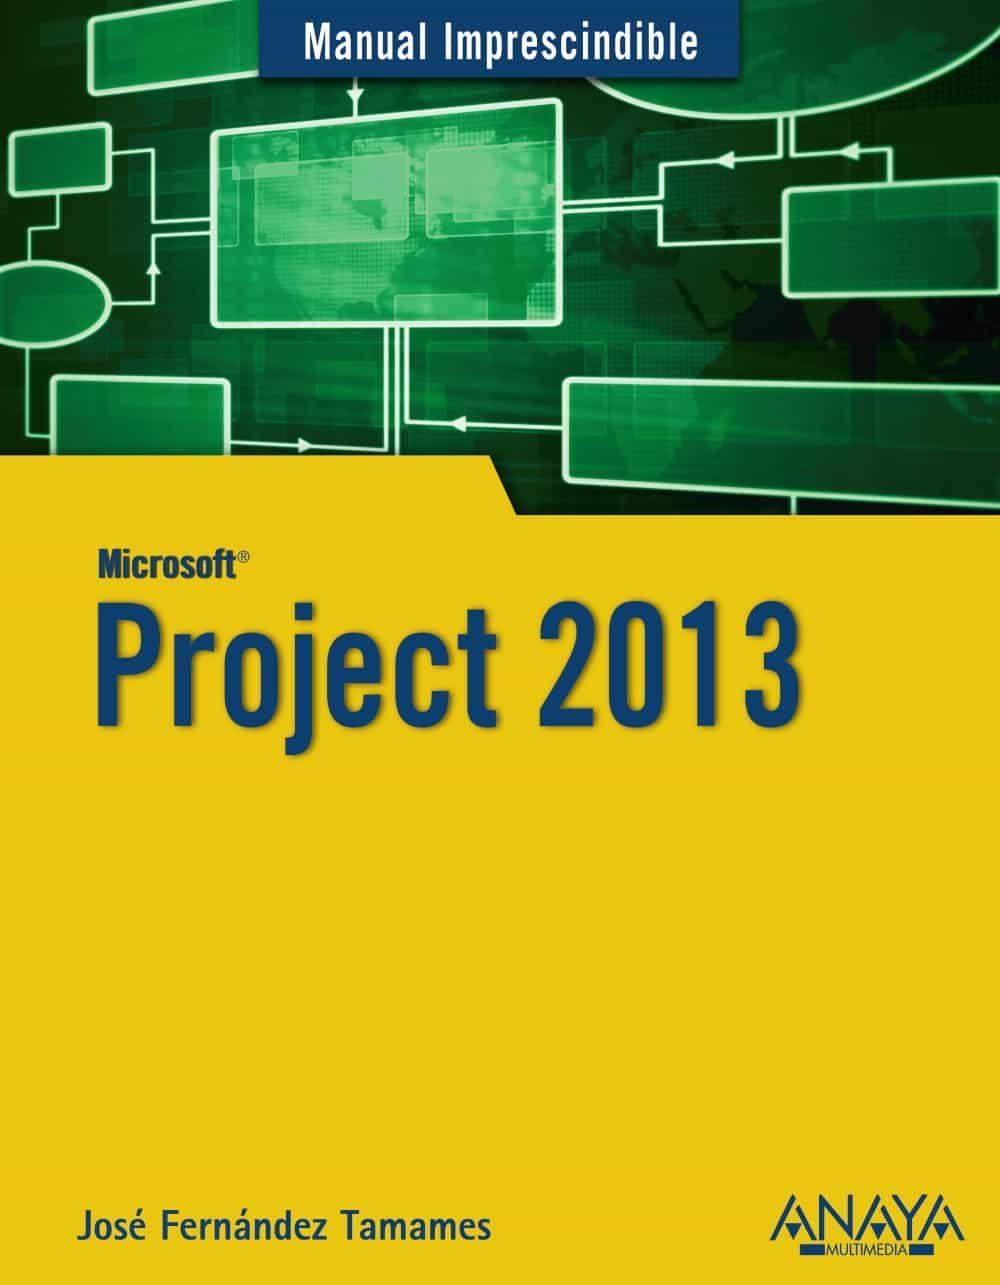 project 2013 manual imprescindible jose fernandez tamames rh casadellibro com manual project 2013 manual project 2013